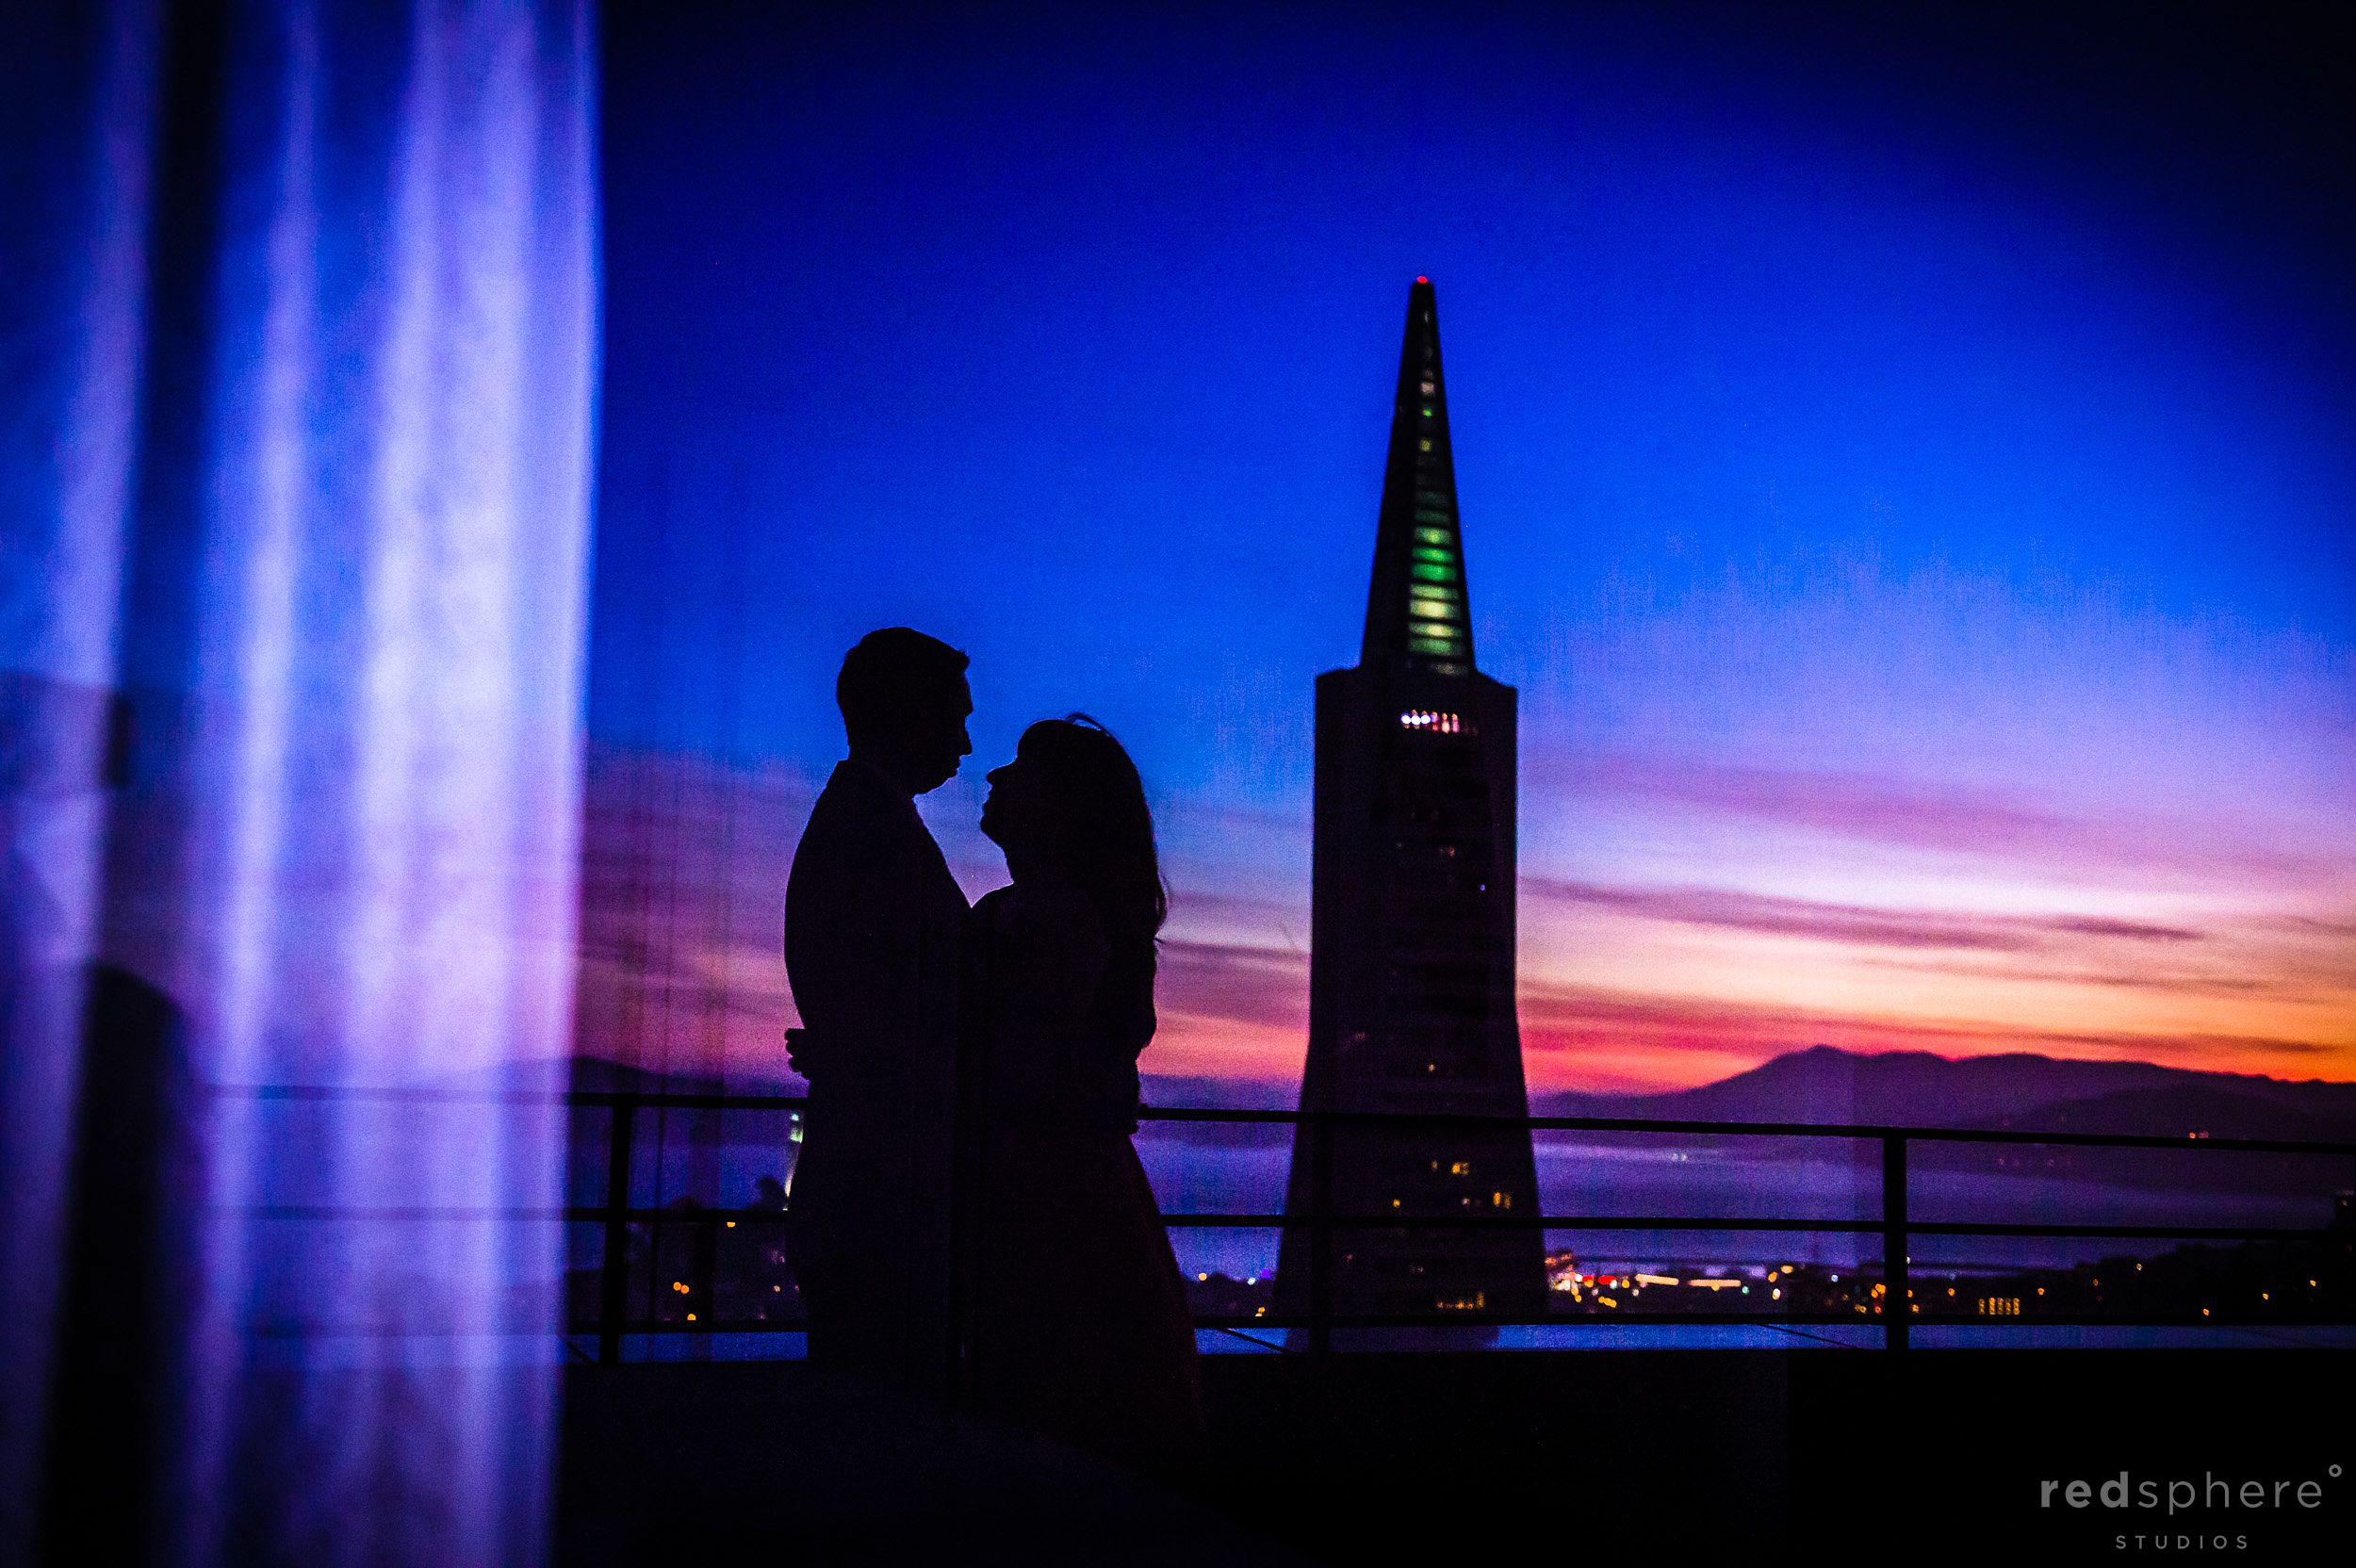 Window Reflection of Couple Silhouette in Mandarin Oriental Hotel San Francisco